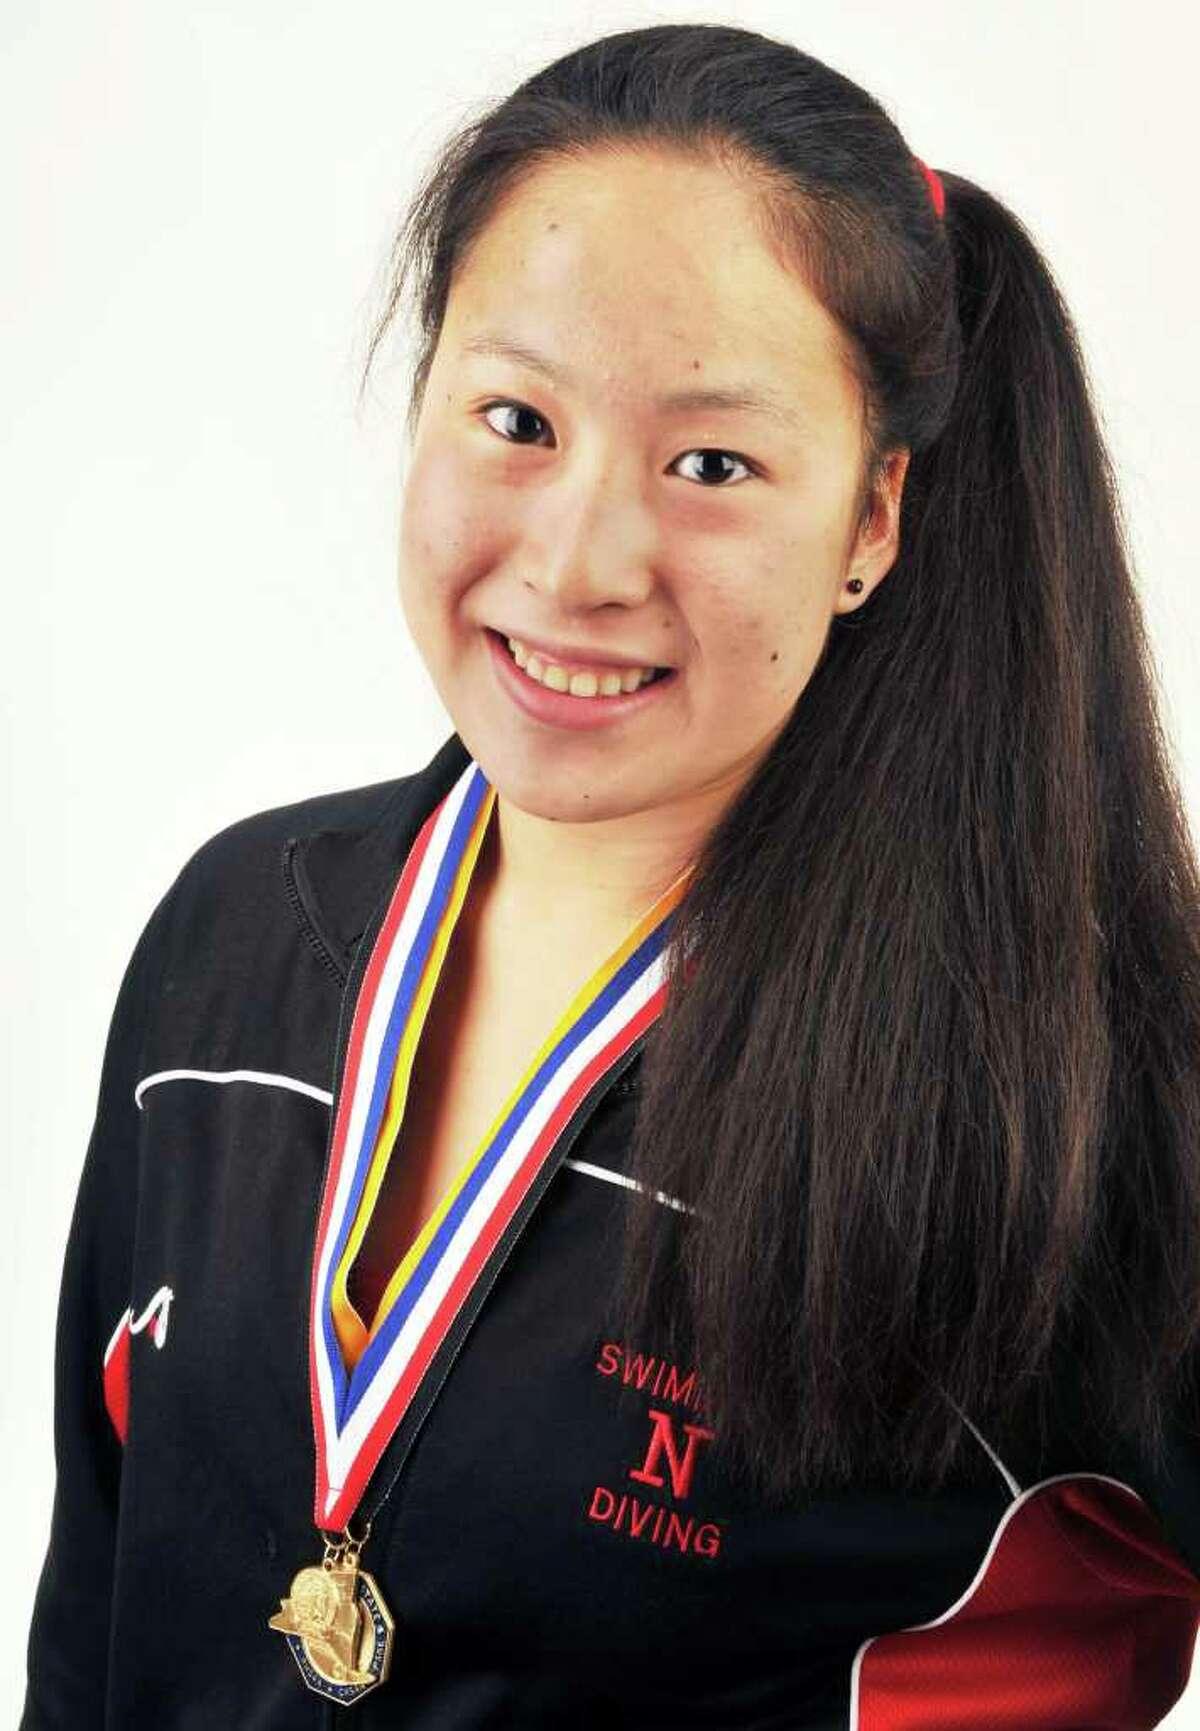 State champion swimmer Kina Zhou of Niskayuna in the Times Union studio Friday Sept. 2, 2011. (John Carl D'Annibale / Times Union)